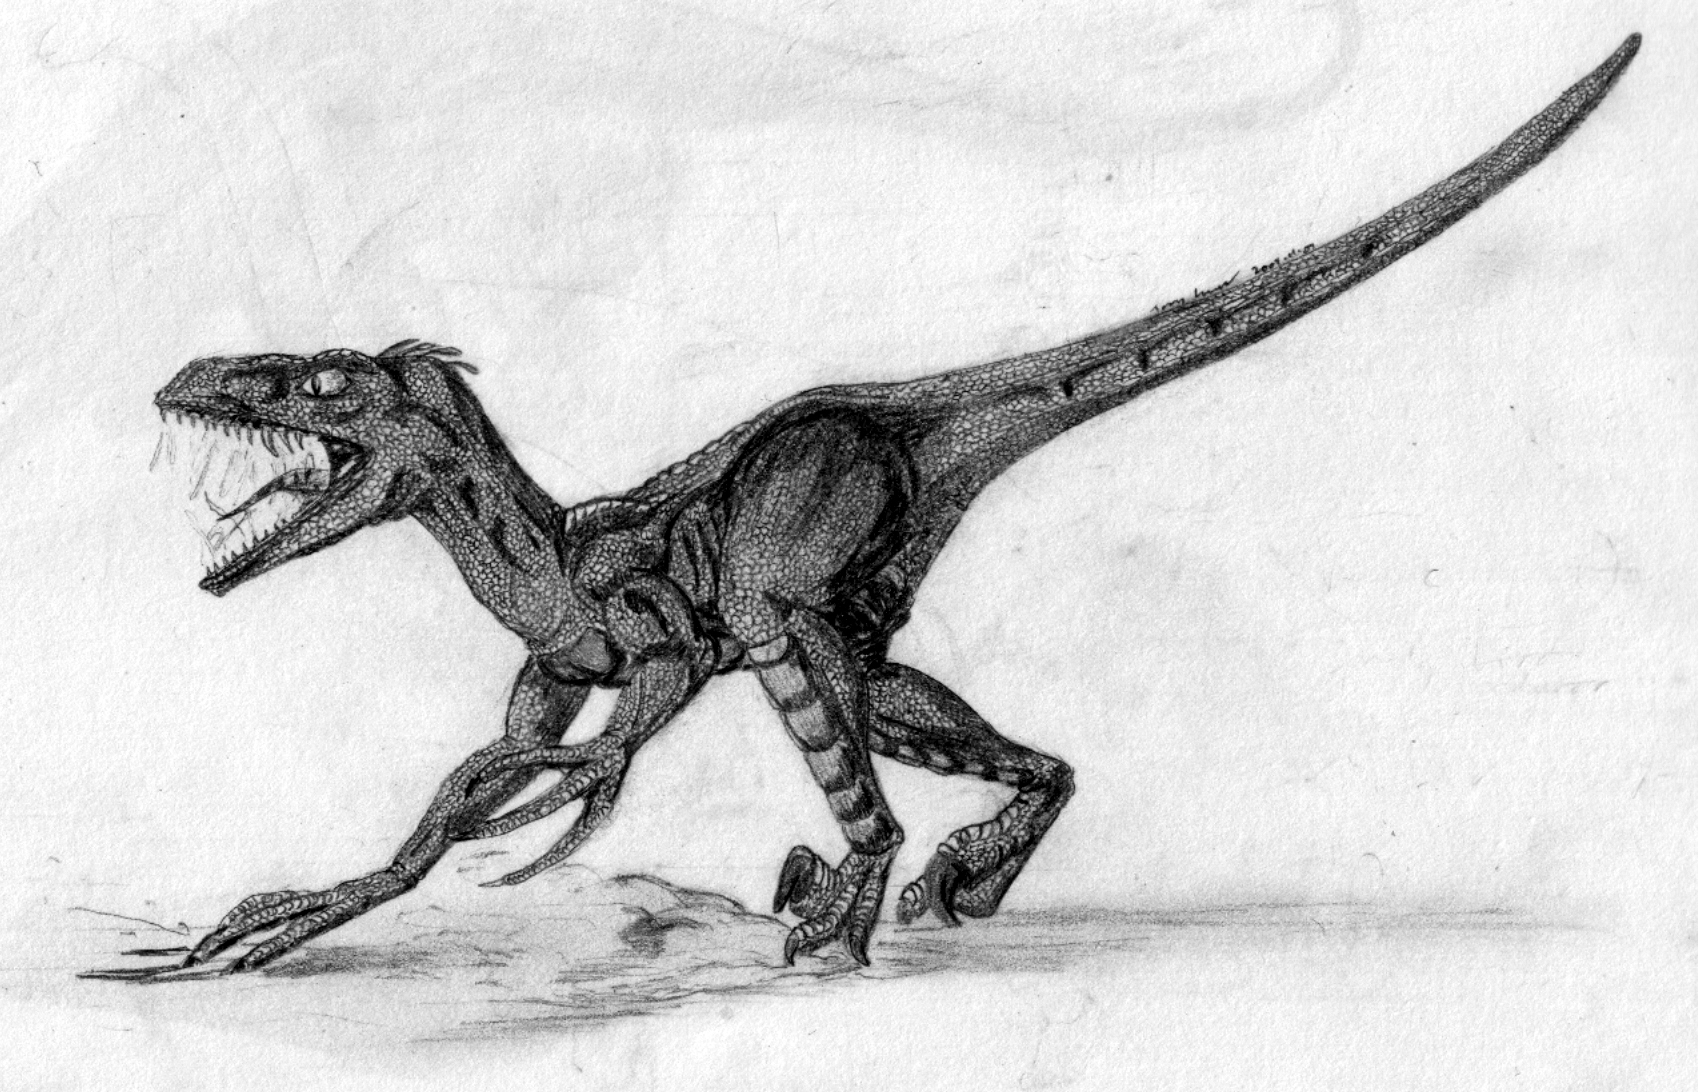 JP Velociraptor by kytjunon